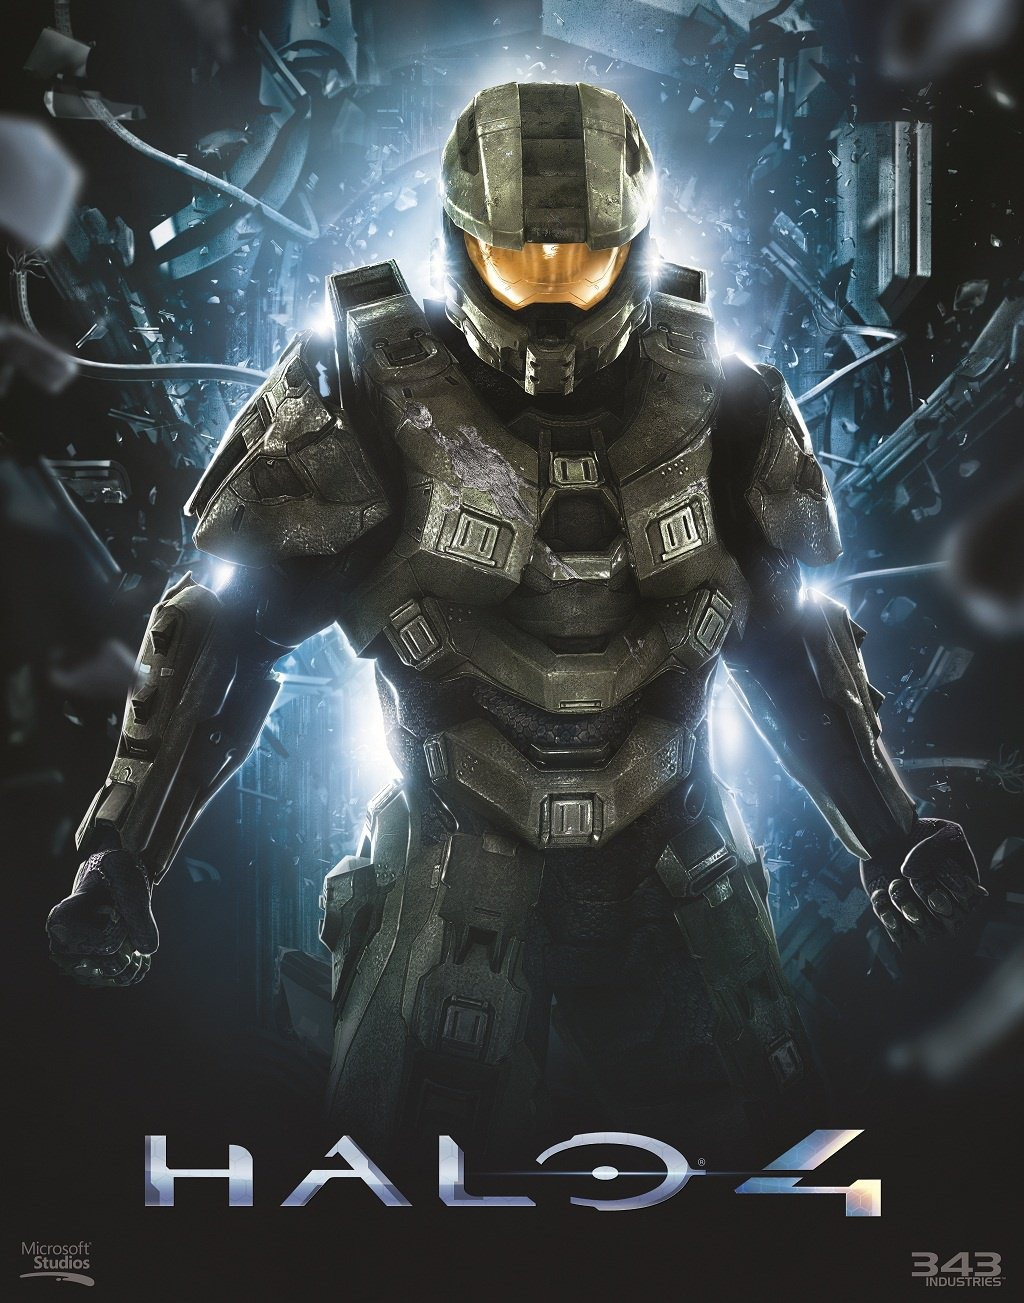 Halo 4 - 2012 [Xbox360] Halo4xbox36013152090360